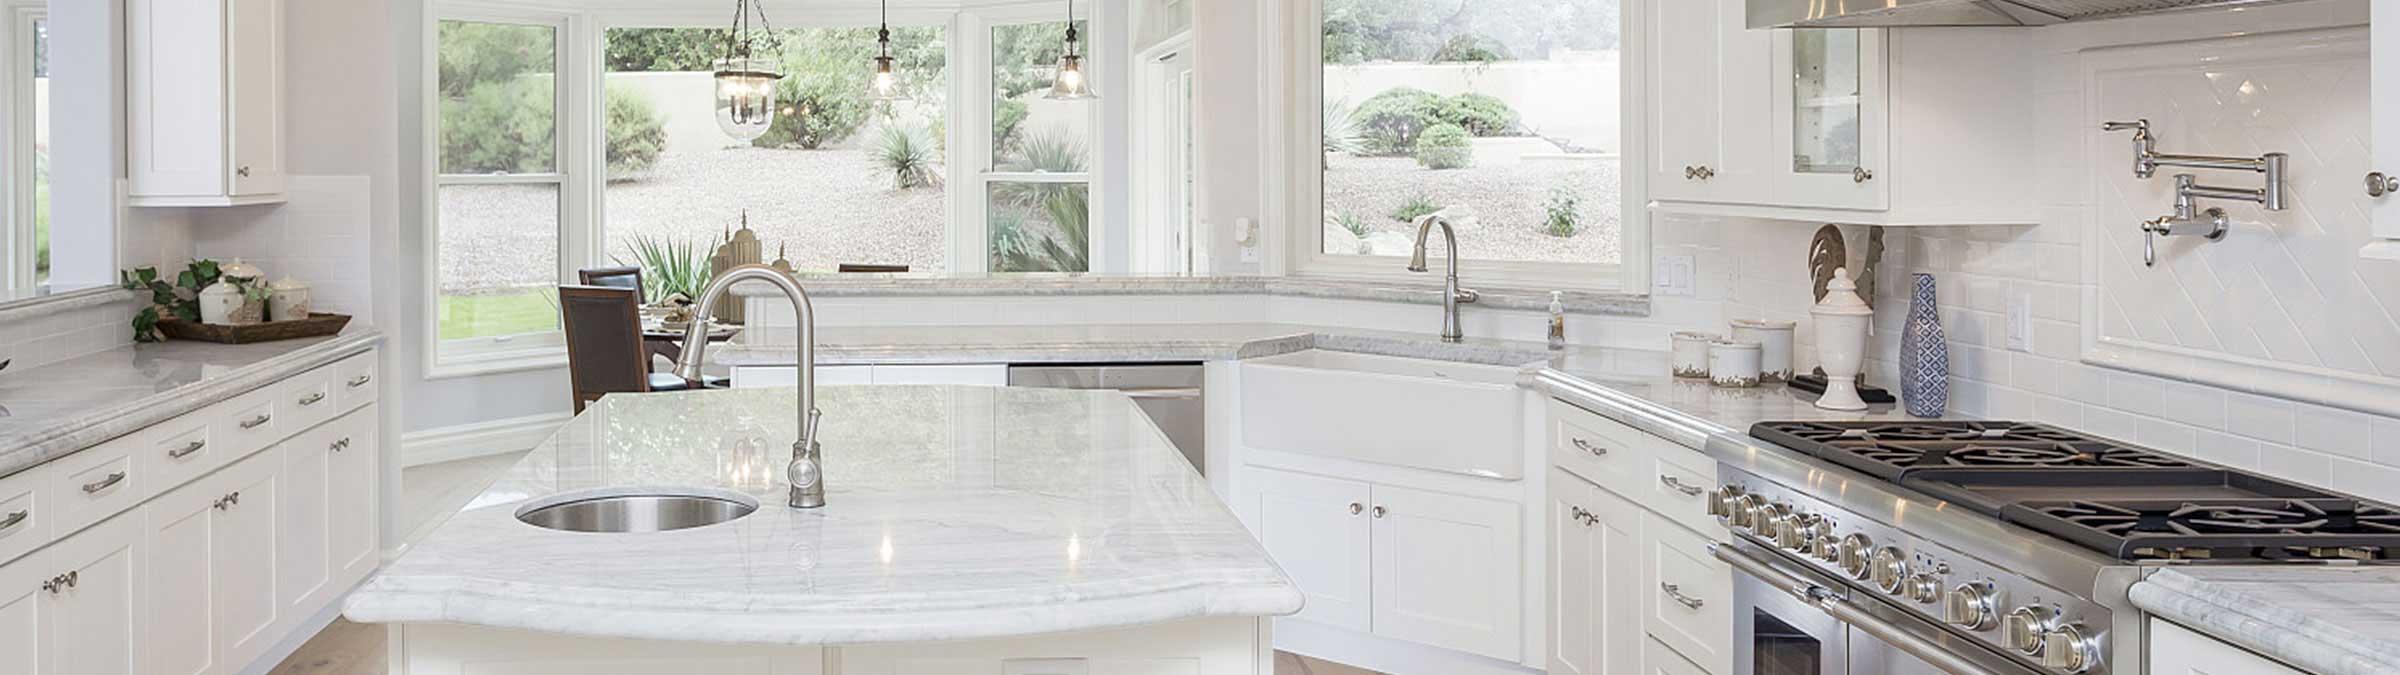 North Scottsdale Real Estate Homes For Sale